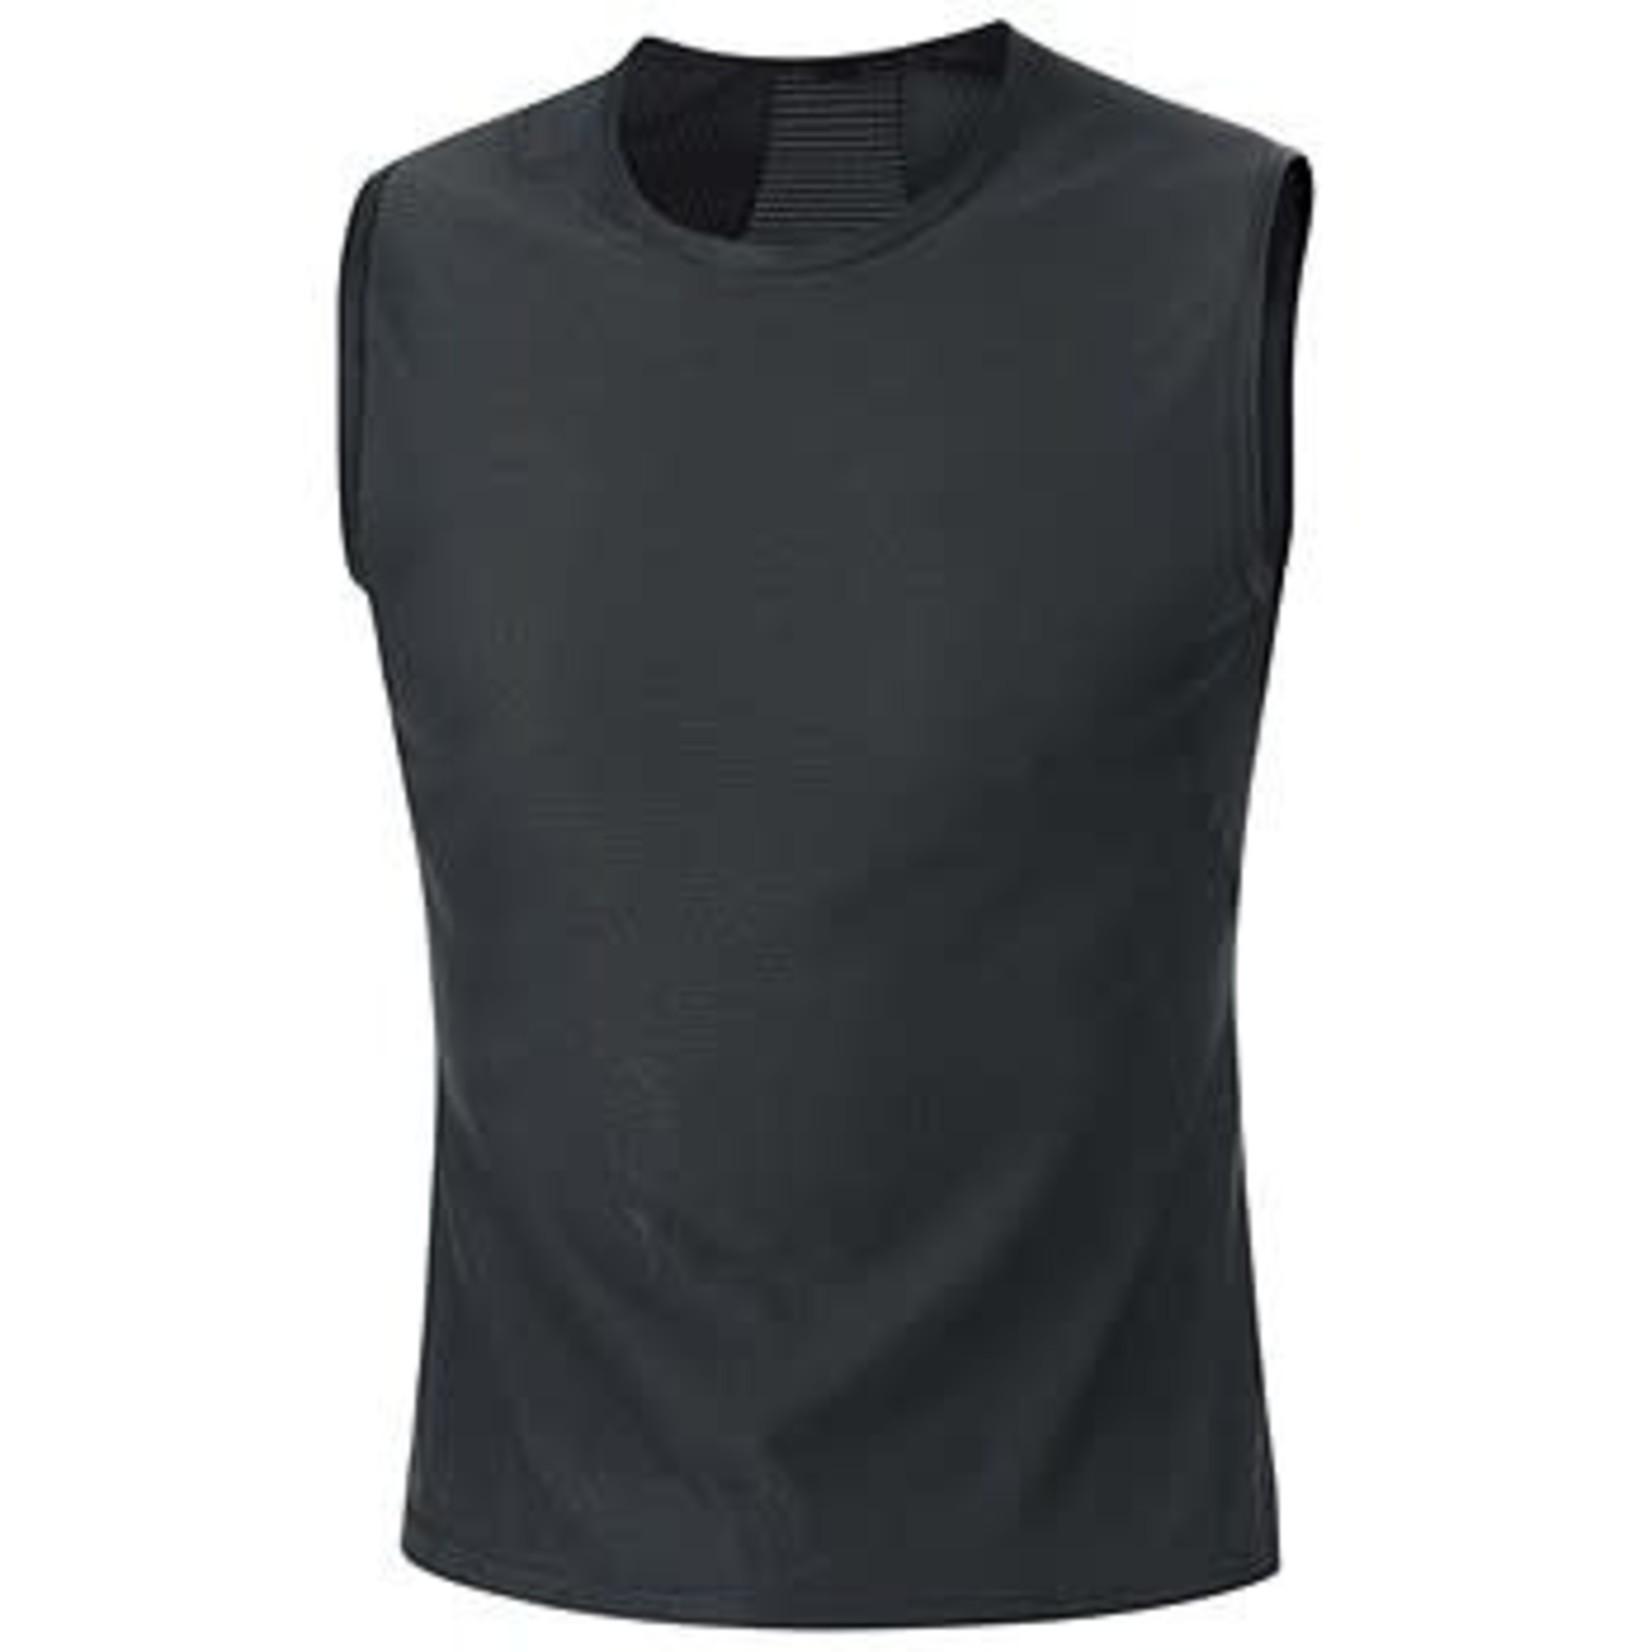 GORE Wear GORE M GWS BL Sleeveless Shirt black XL